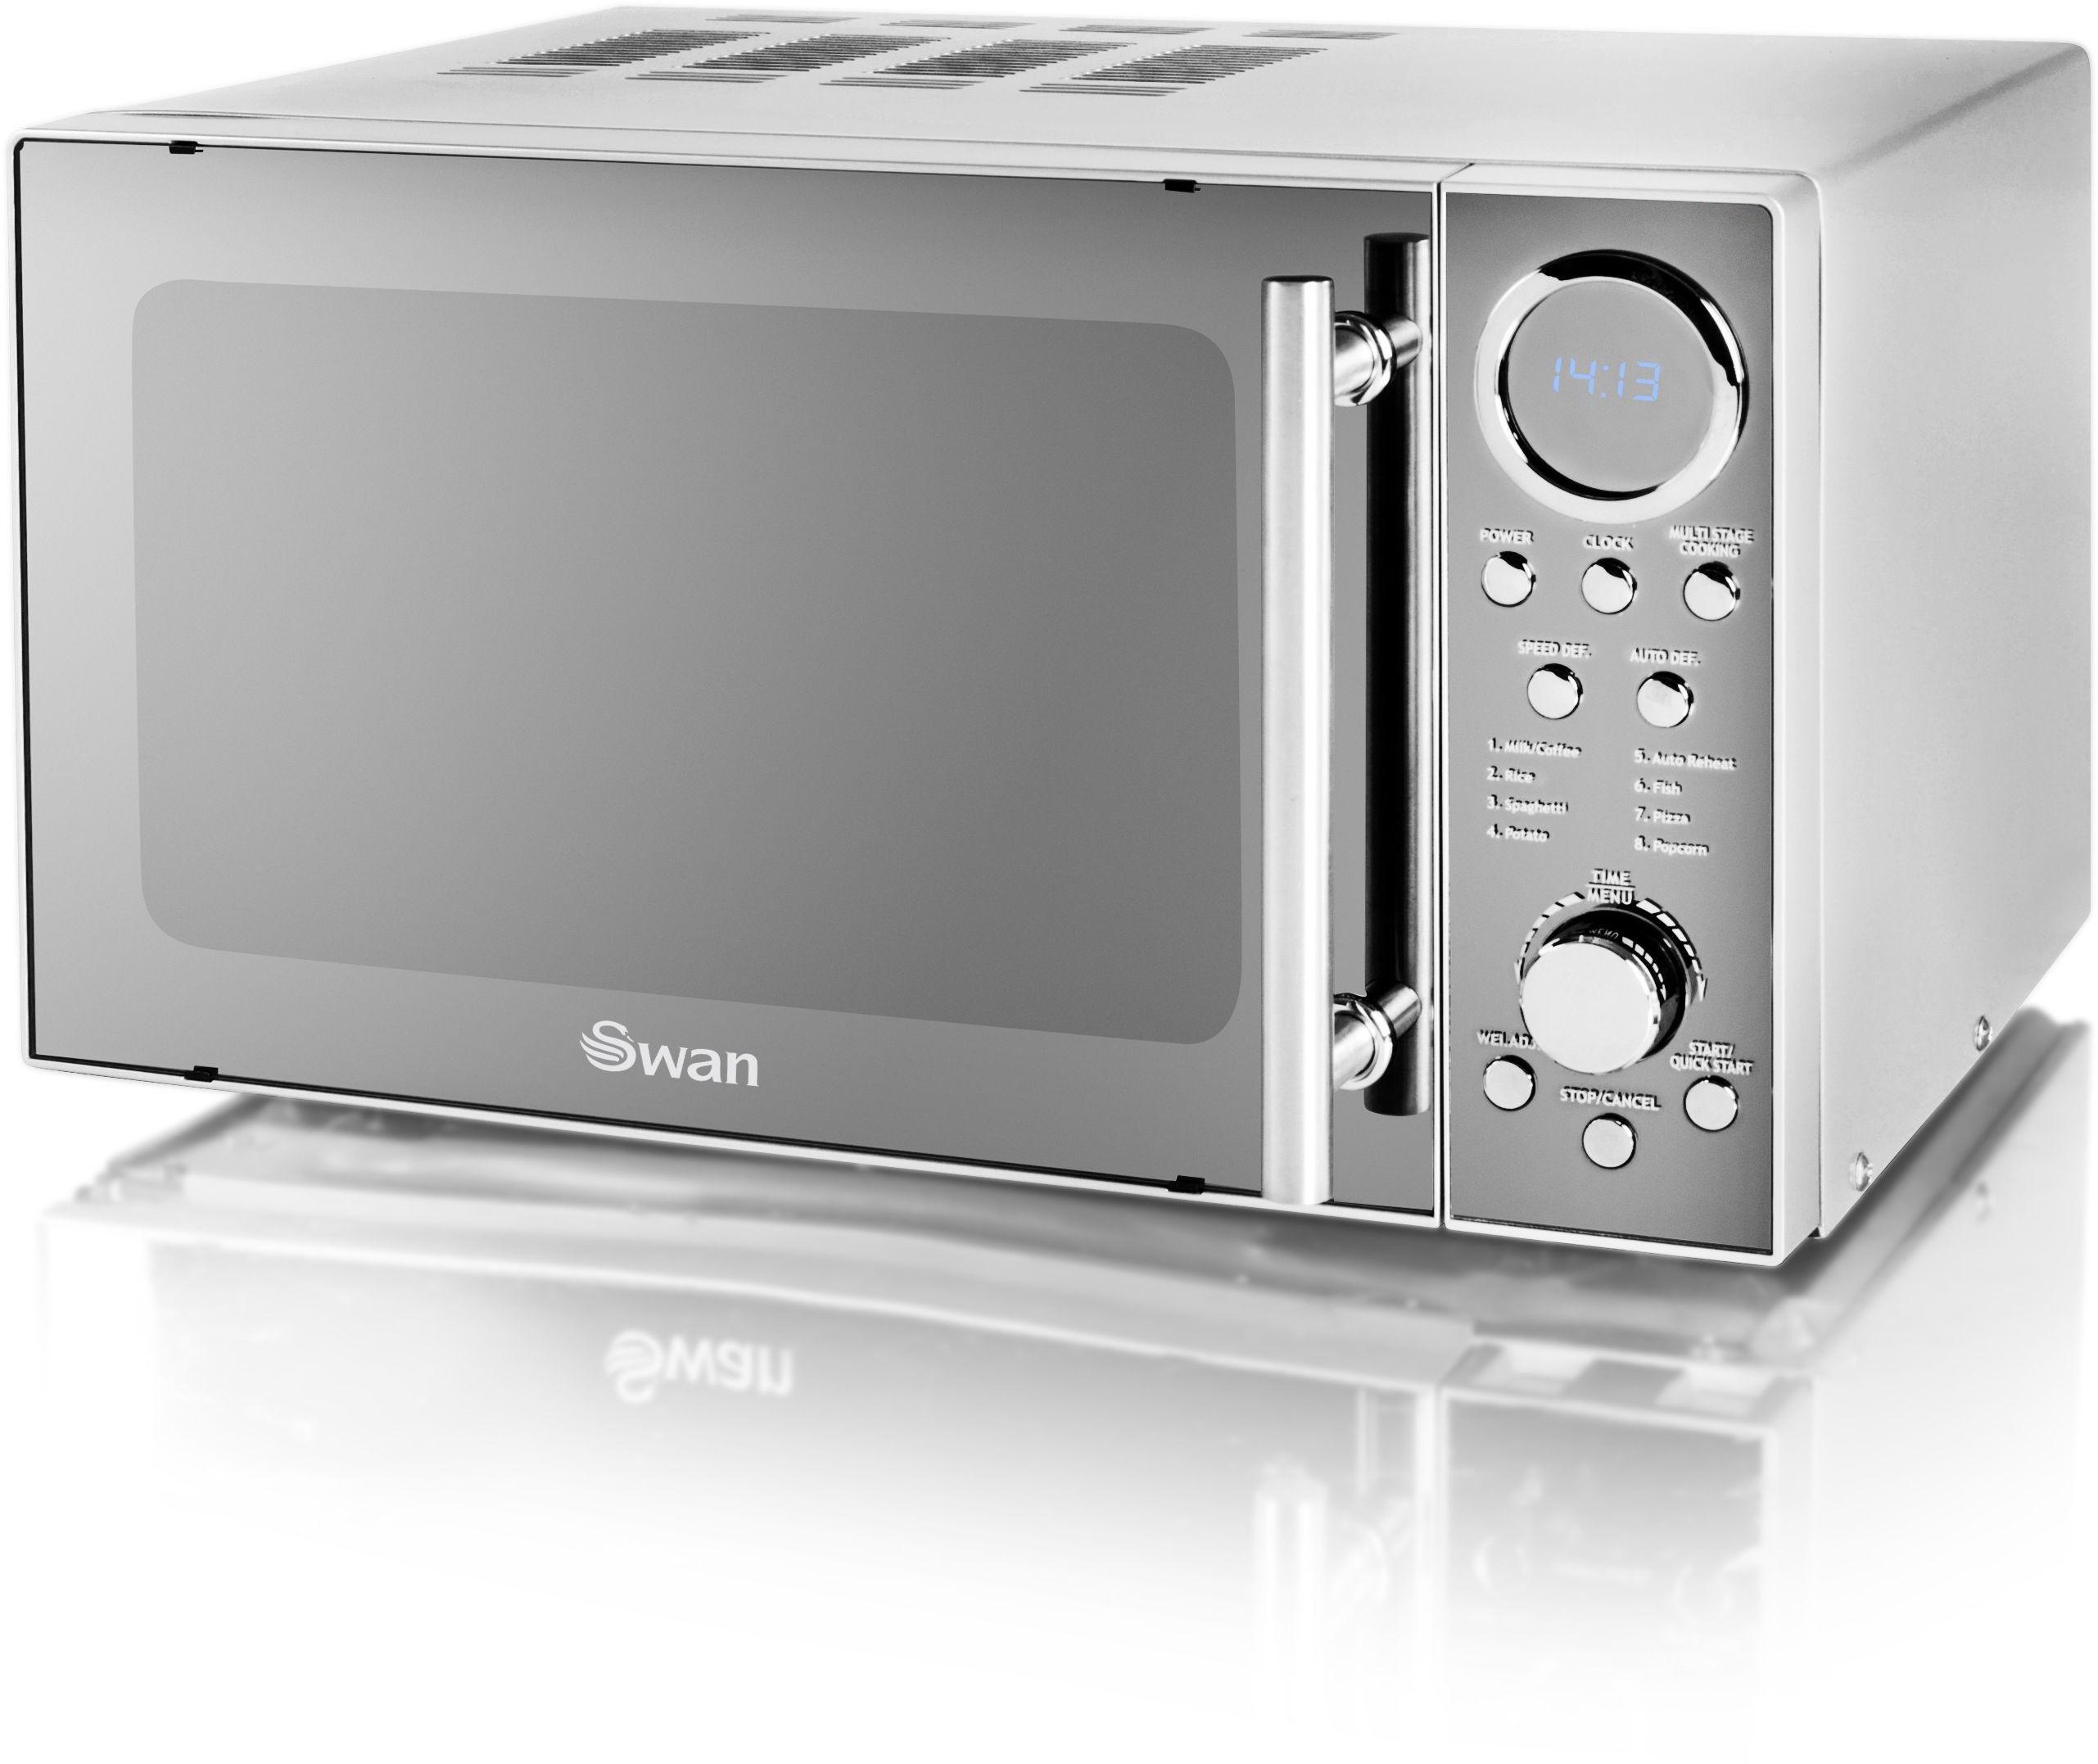 Swan - Standard Microwave -SM3080N -Chrome